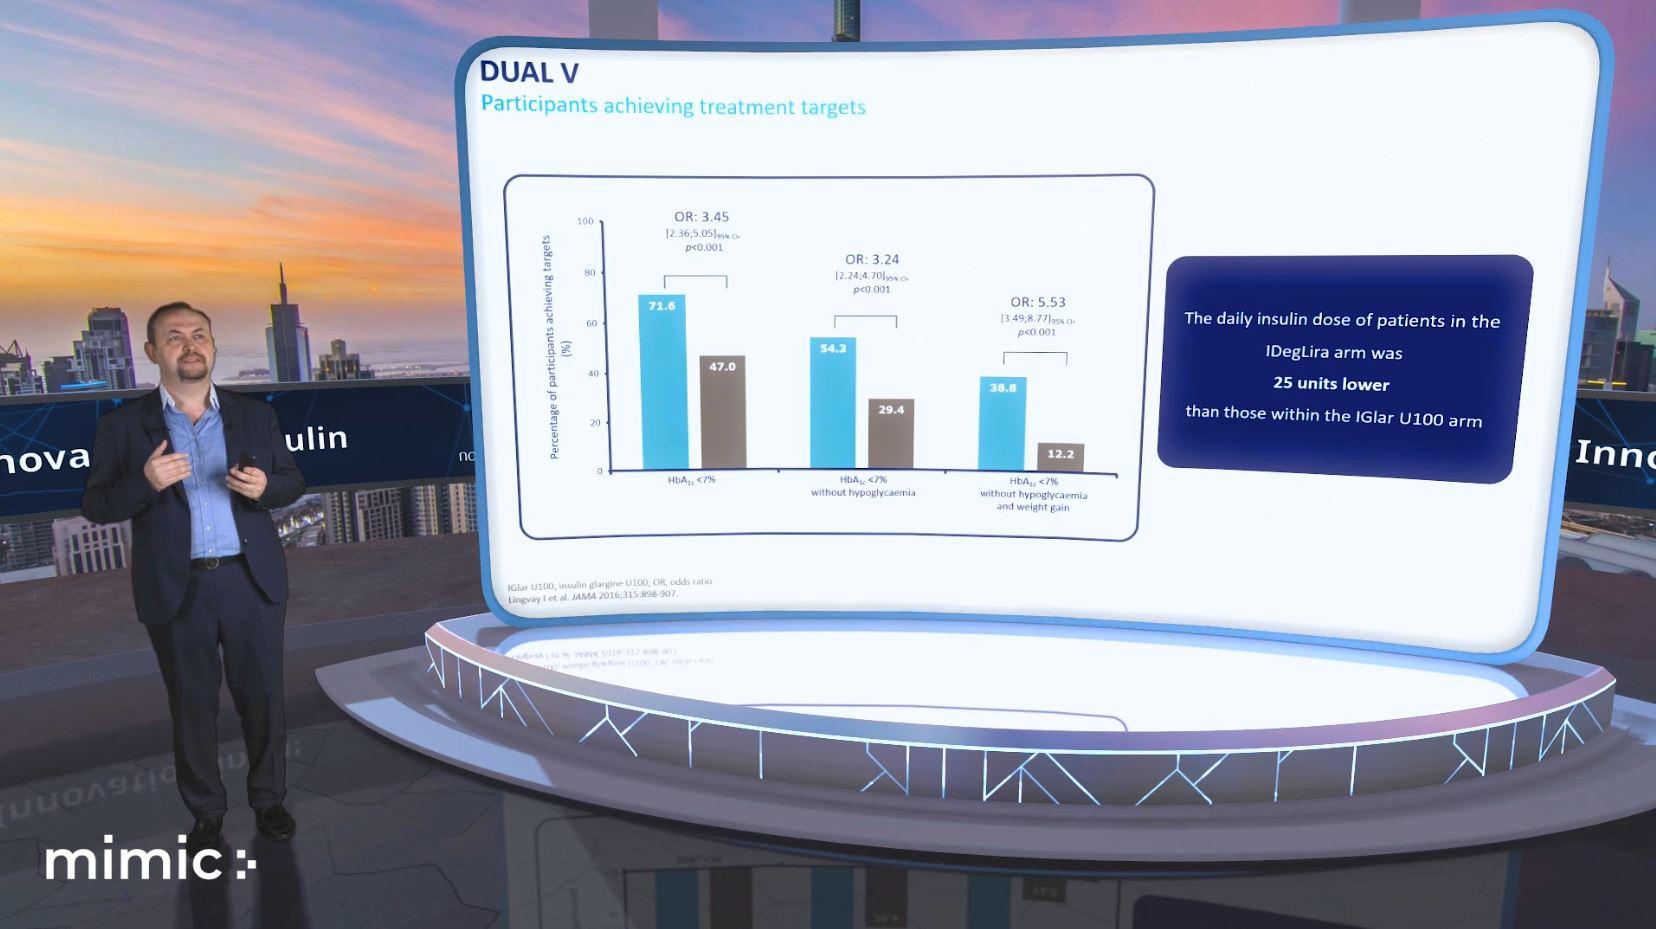 virtual stage interactive presentation mimic graphic charts presentation